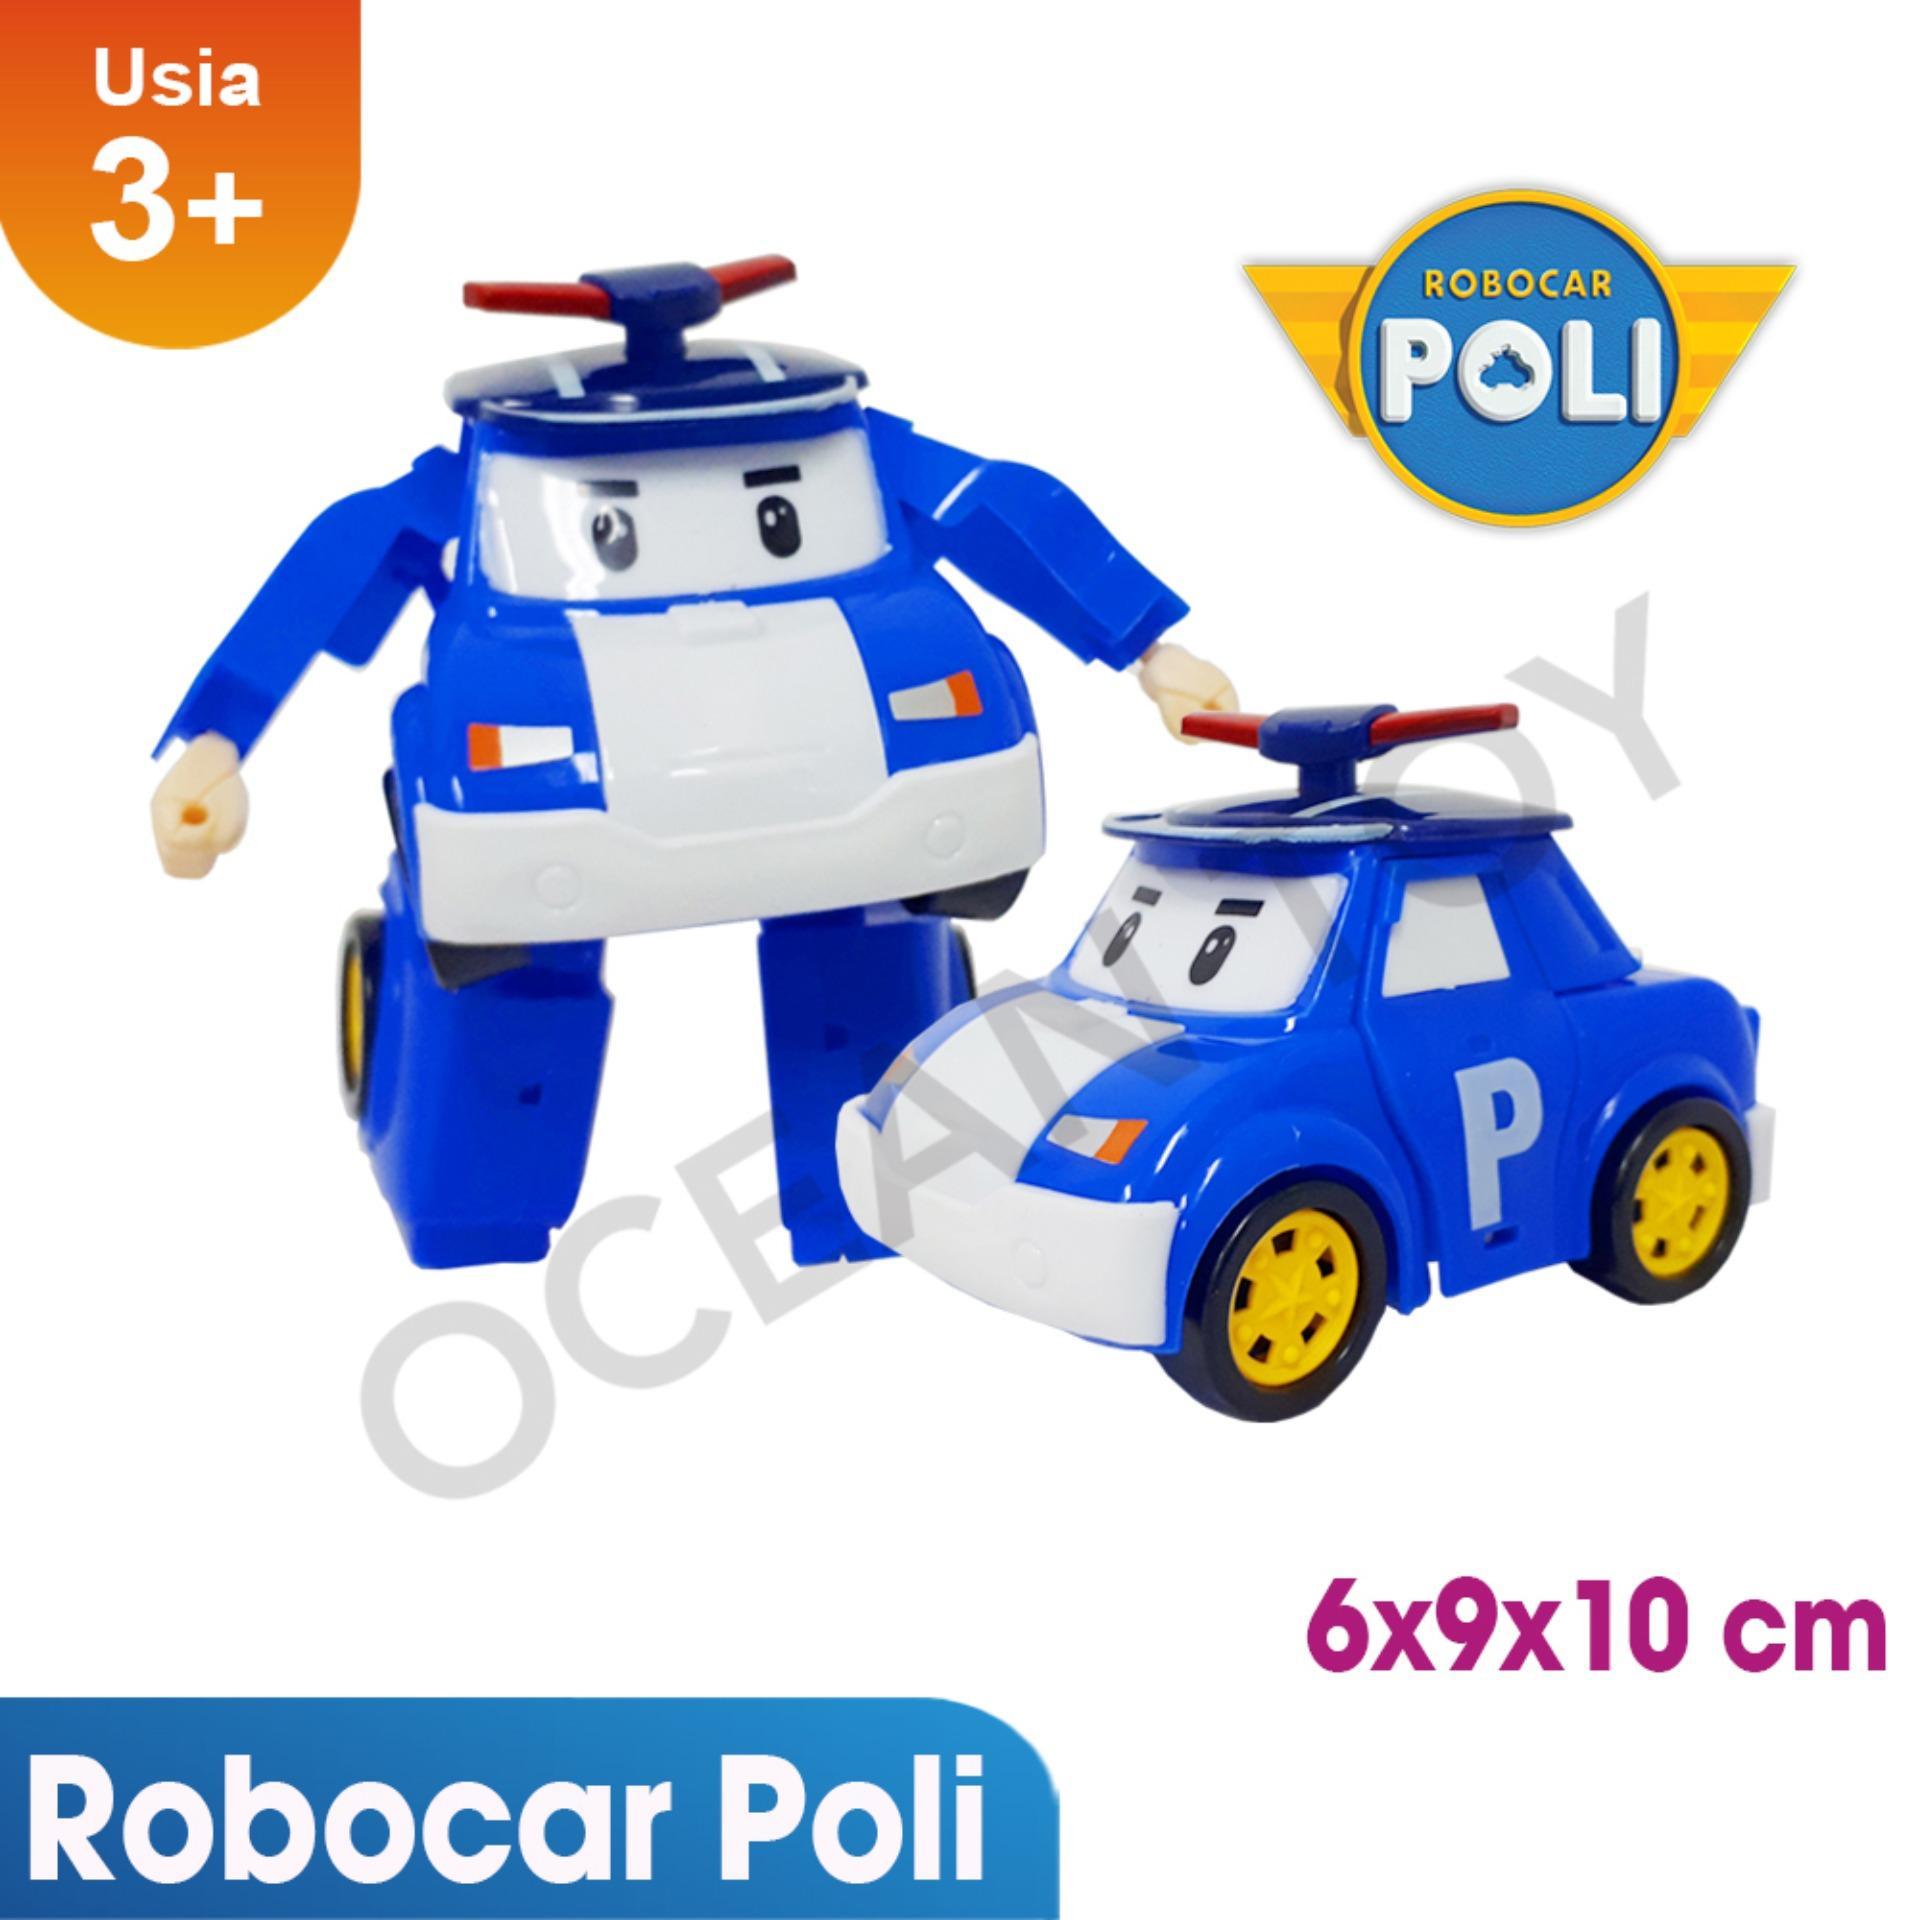 Robocar Poli Lazada Birthday Special